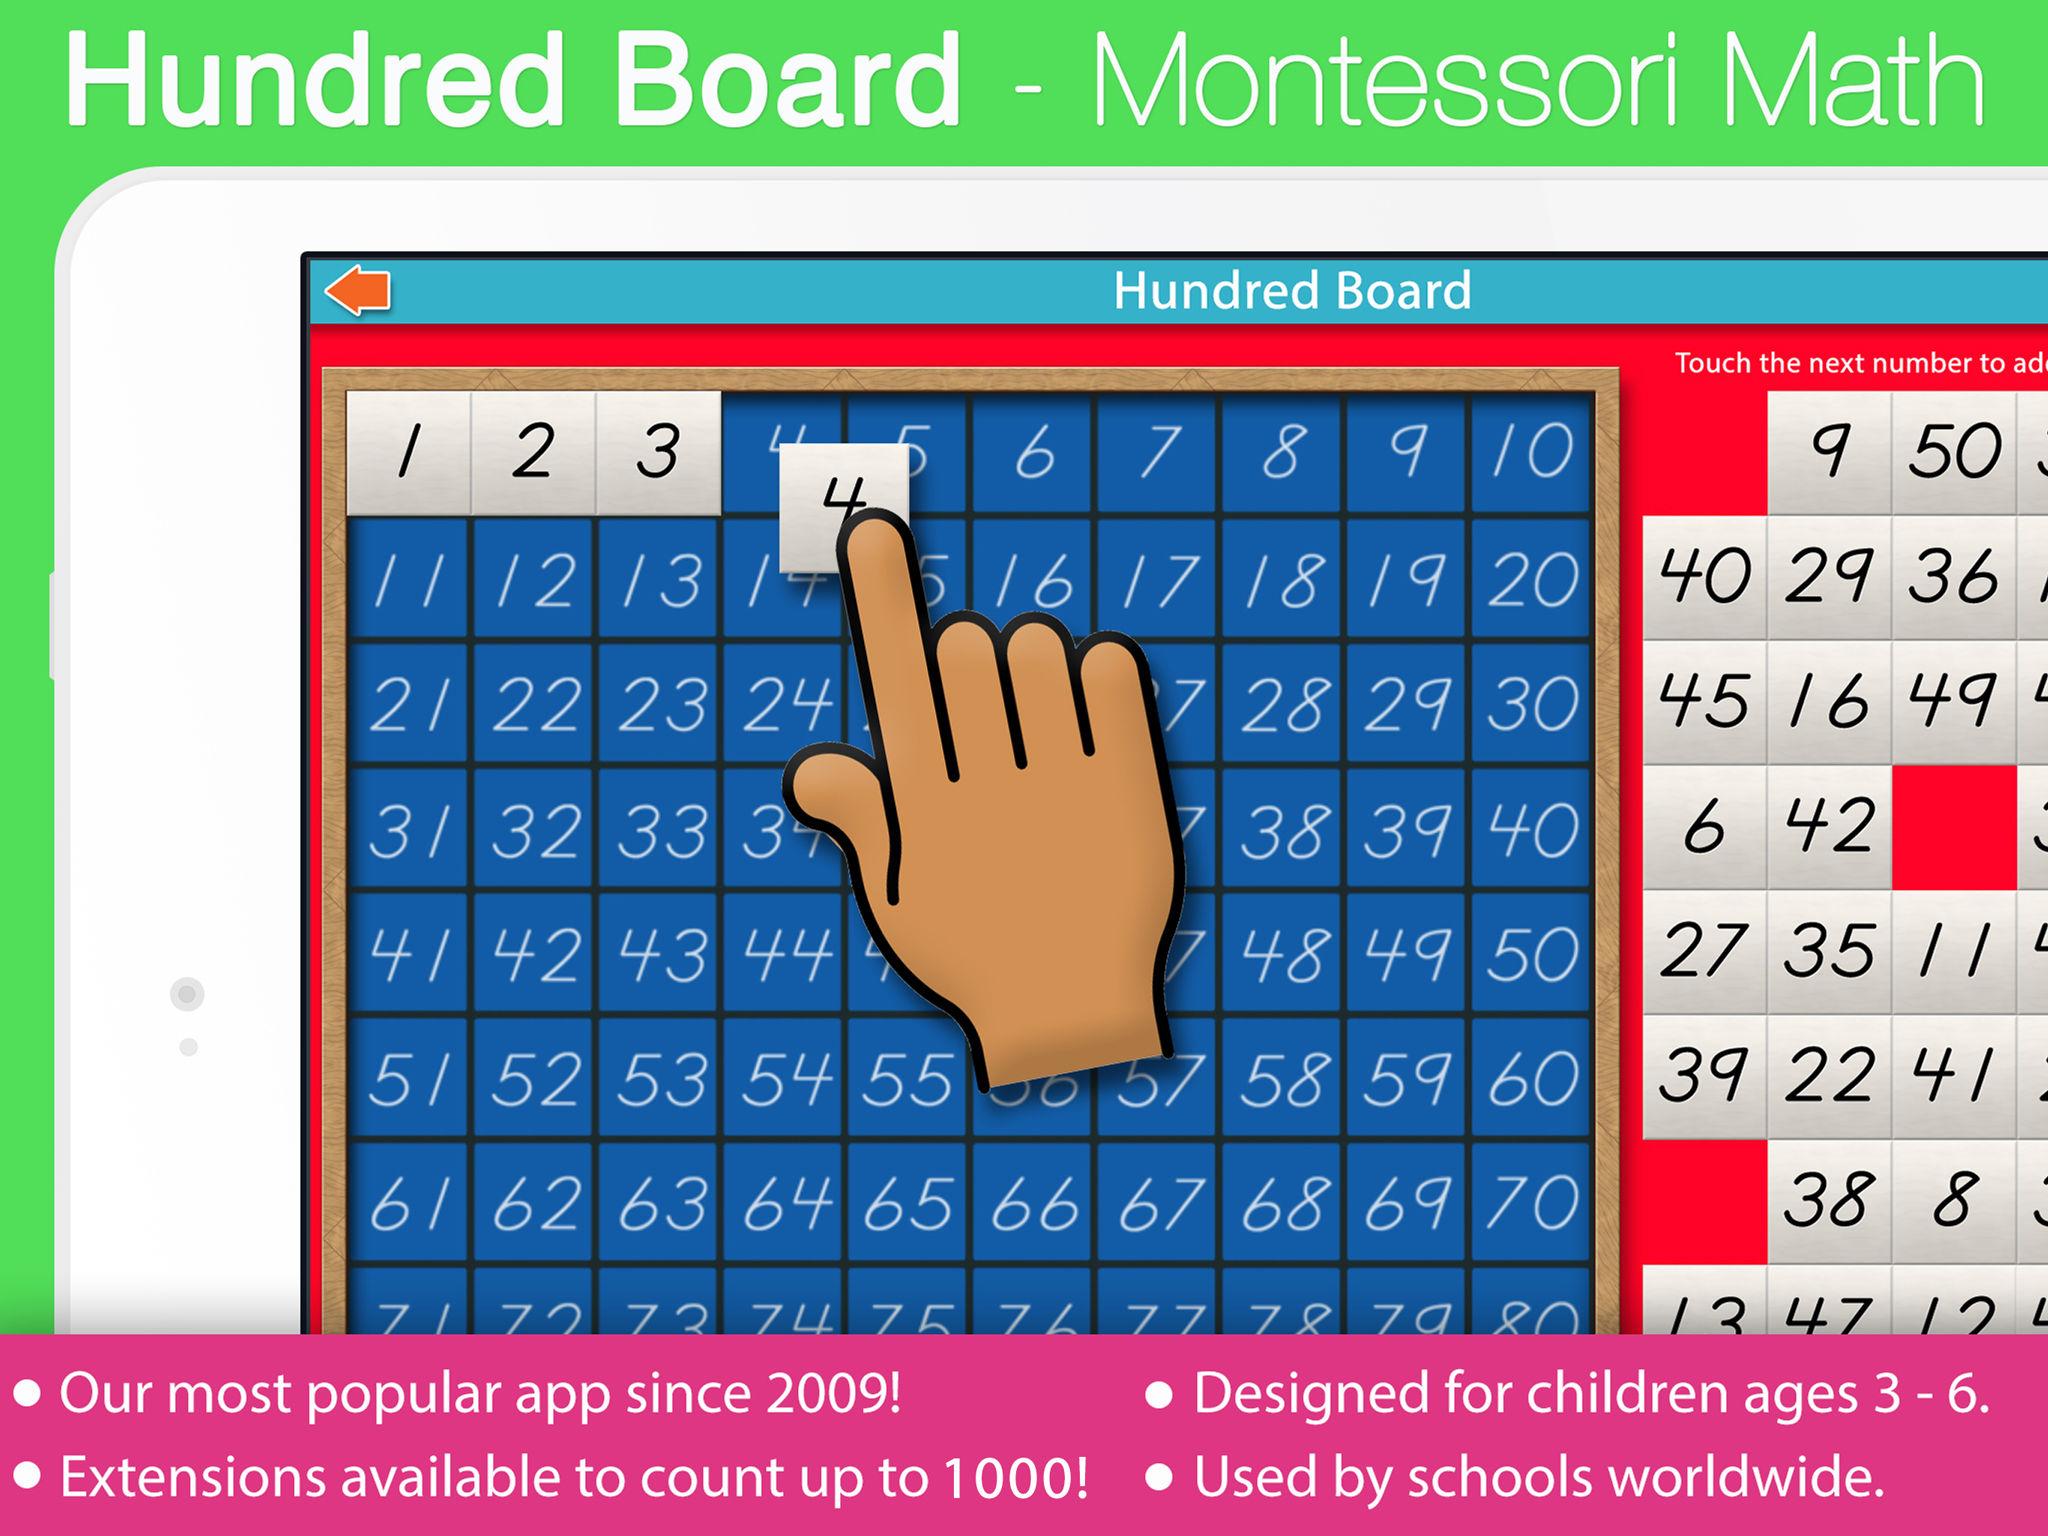 MontessoriHundredBoardapp-1.jpg